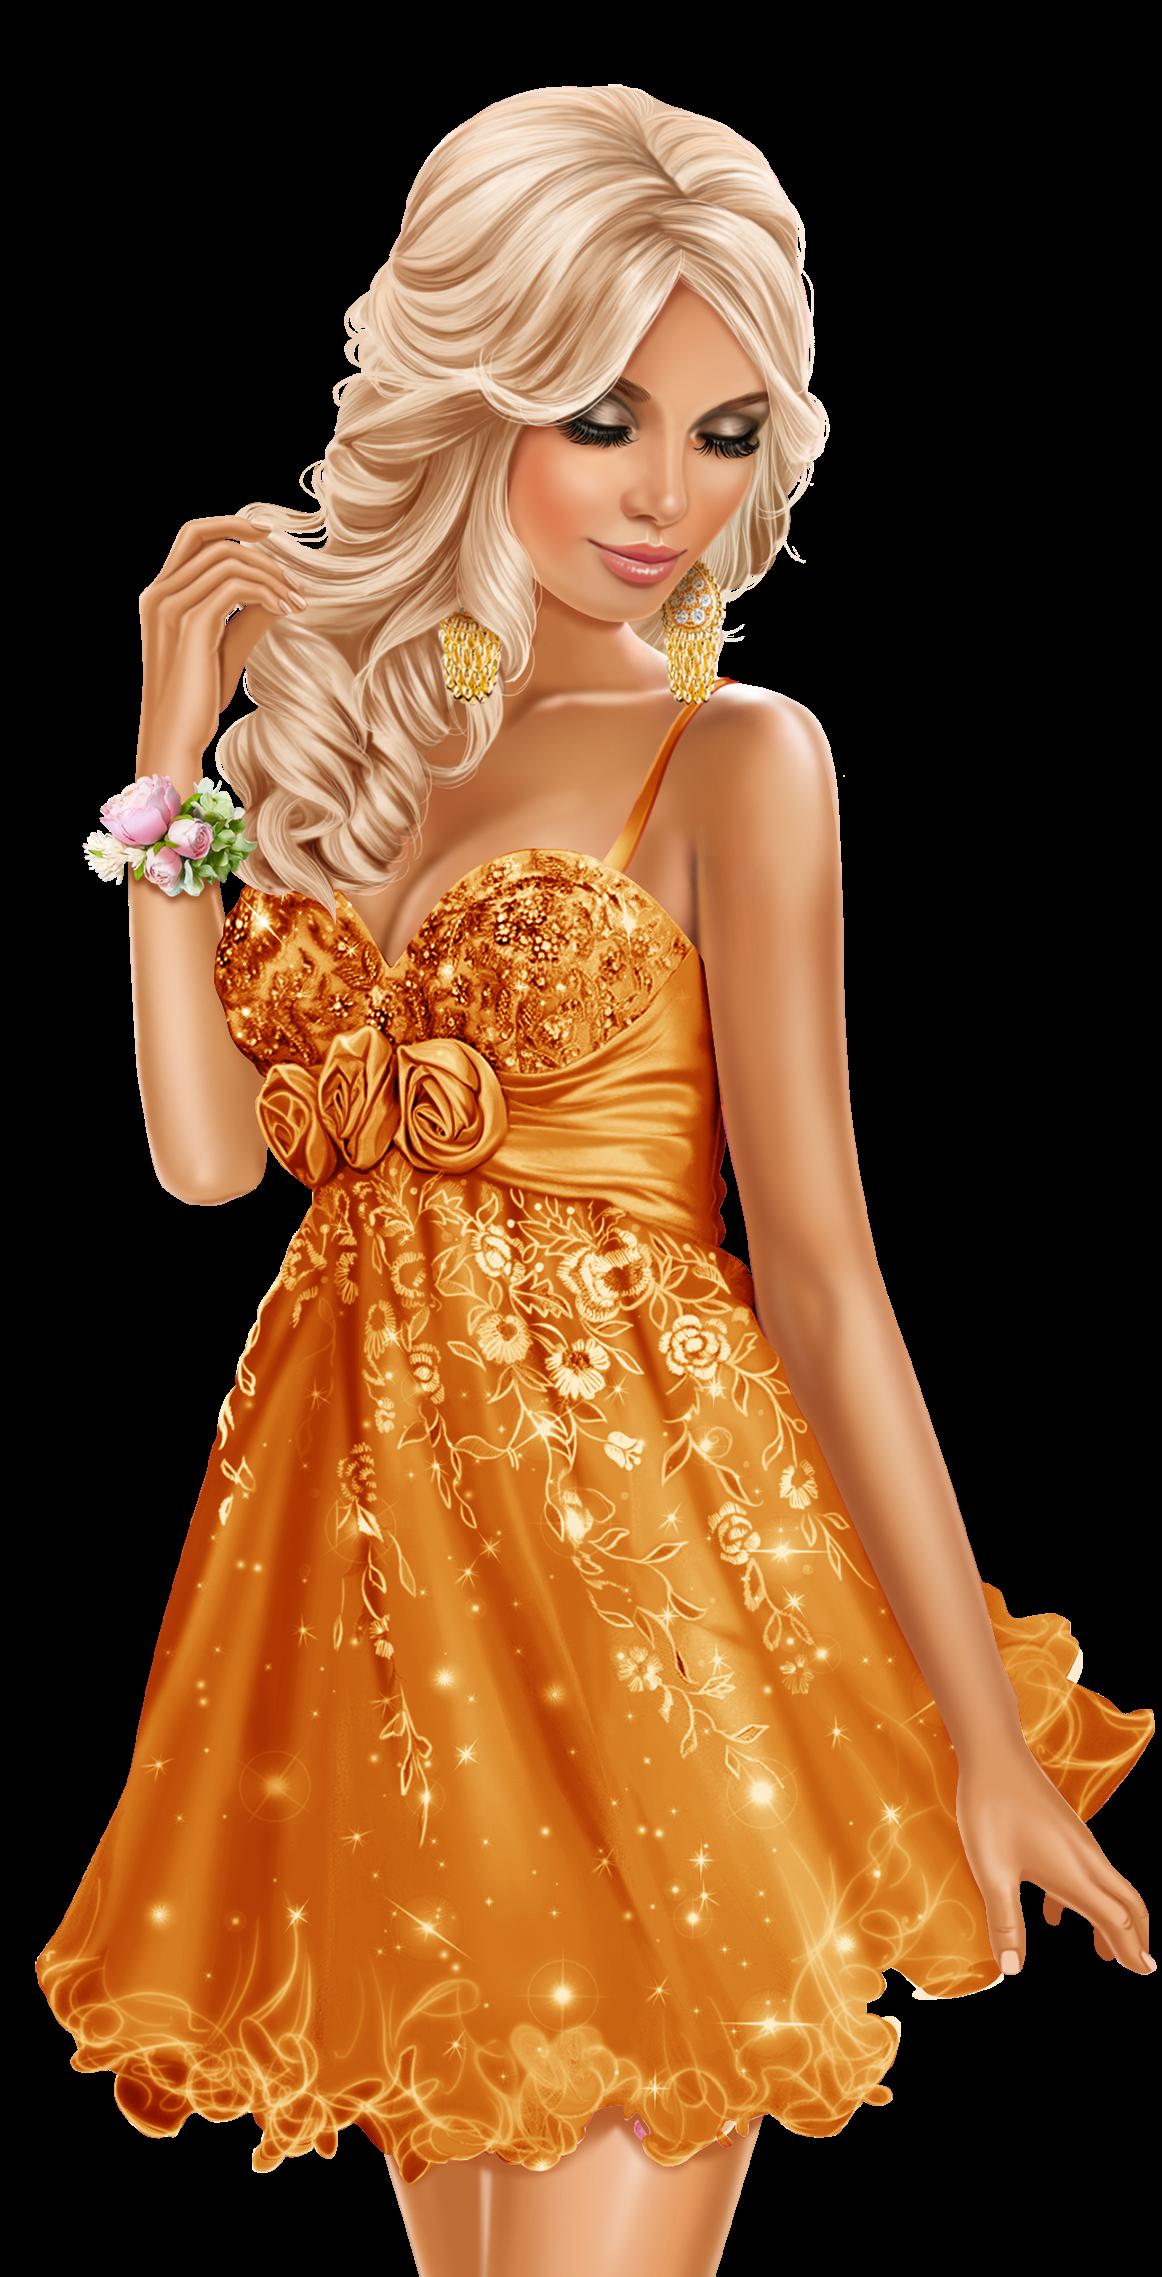 Fashion clipart girly dress. Vfl ru vflru